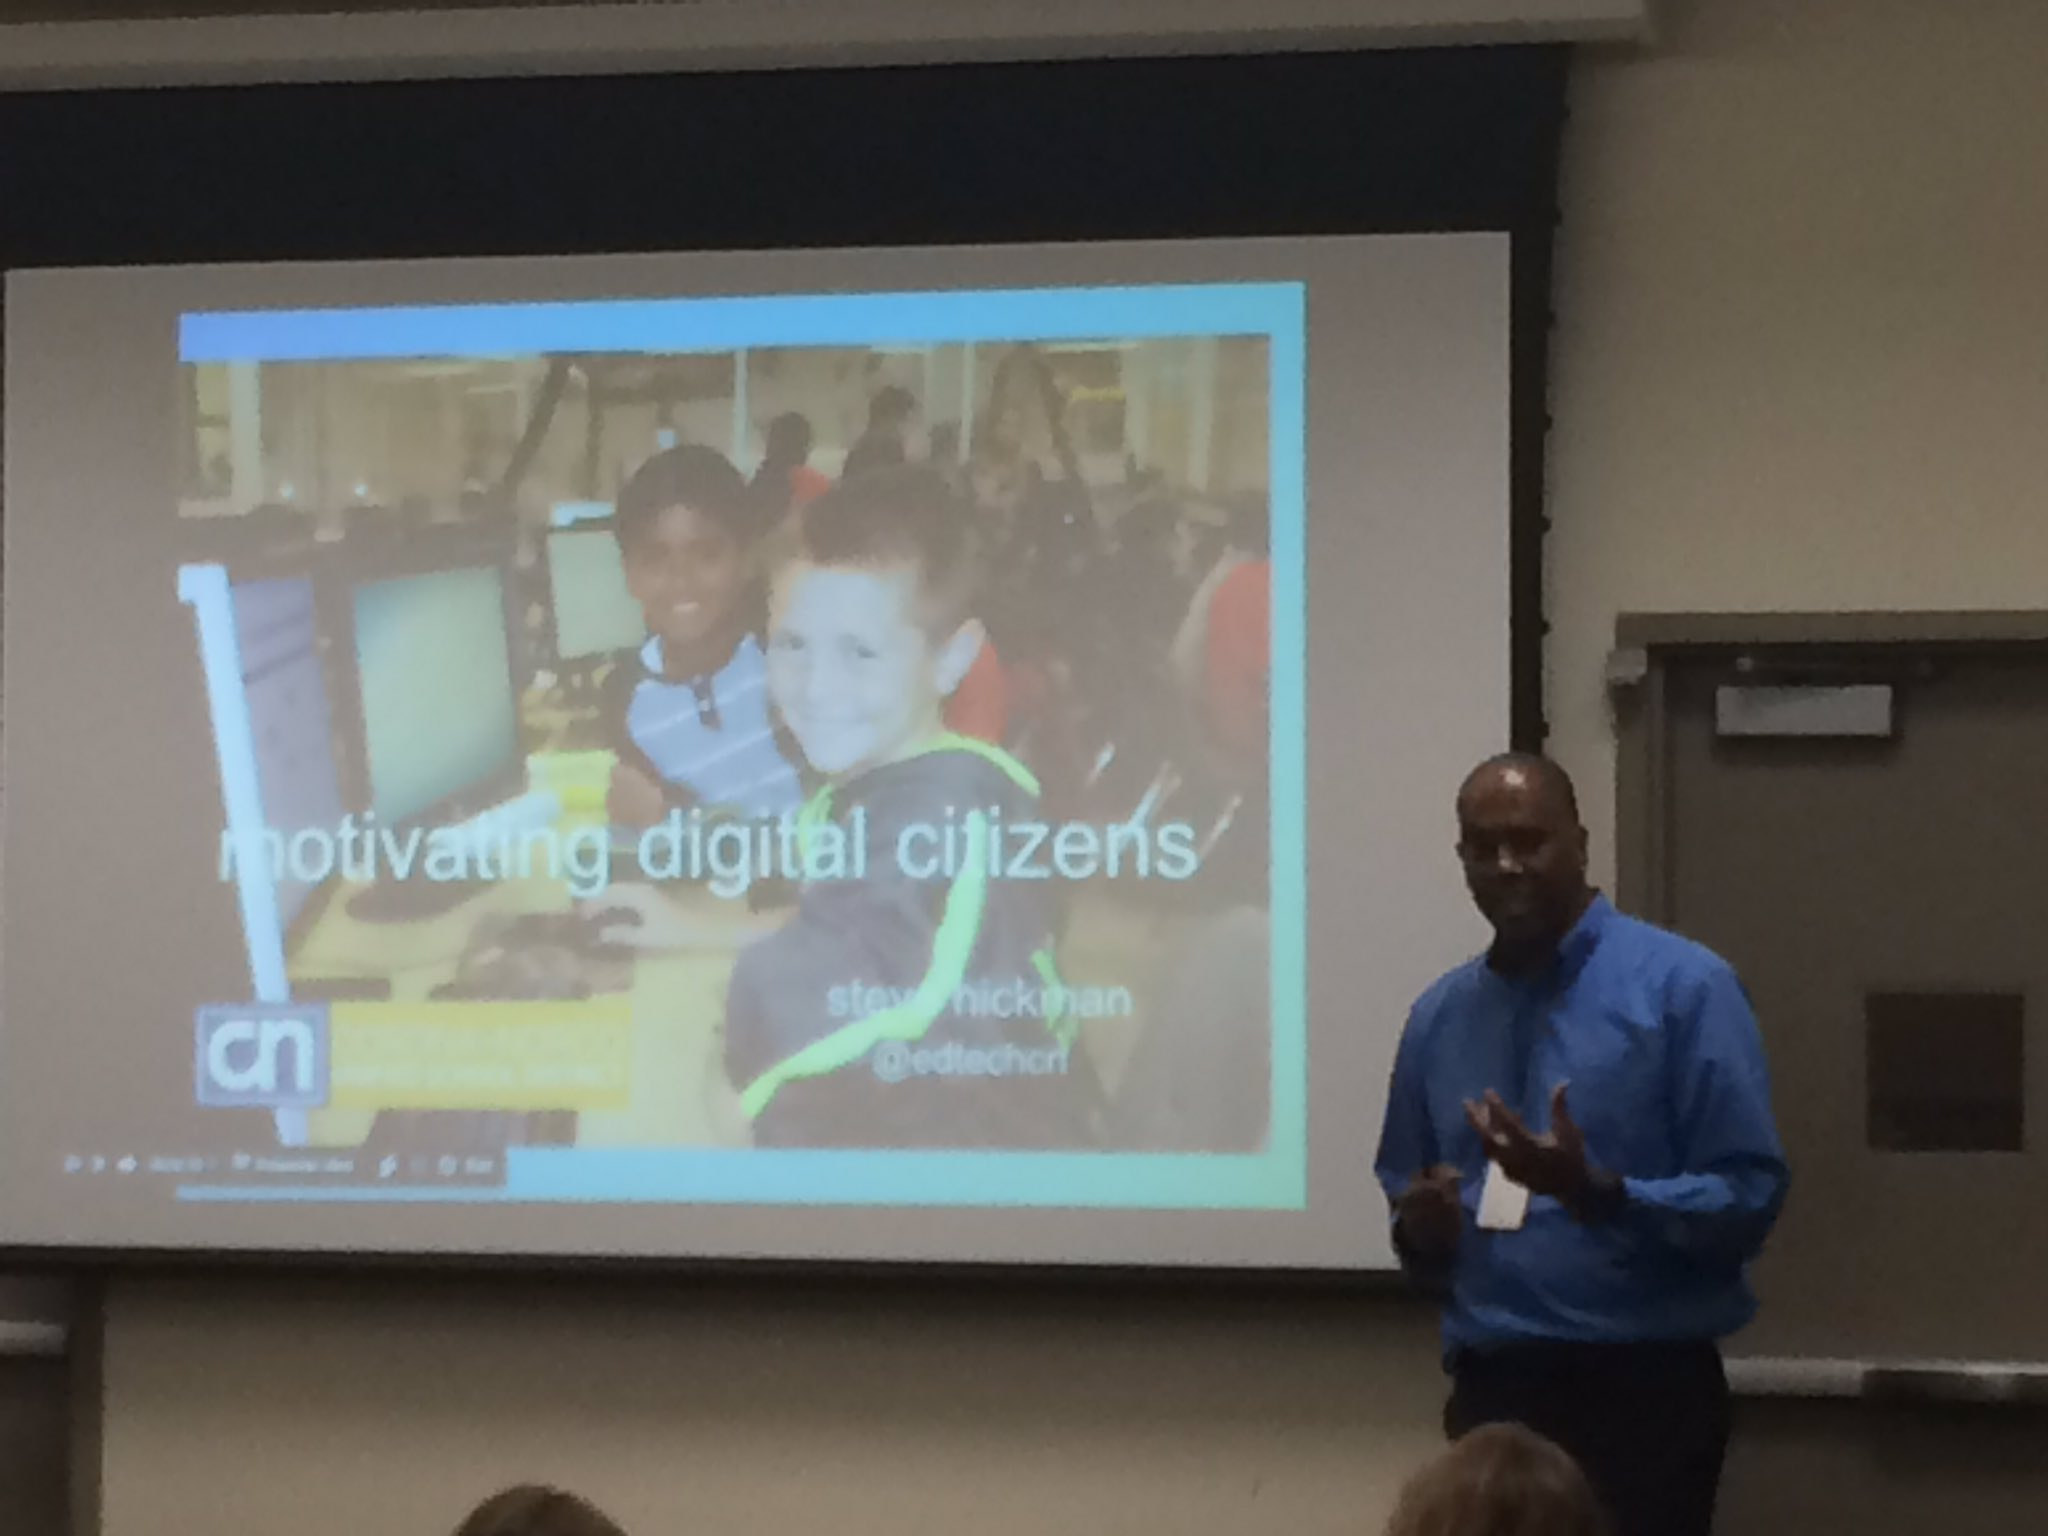 .@edtechcn presenting on Digital Citizenship at #2016DML (w/ @SueThotz) https://t.co/C4FOpmytET